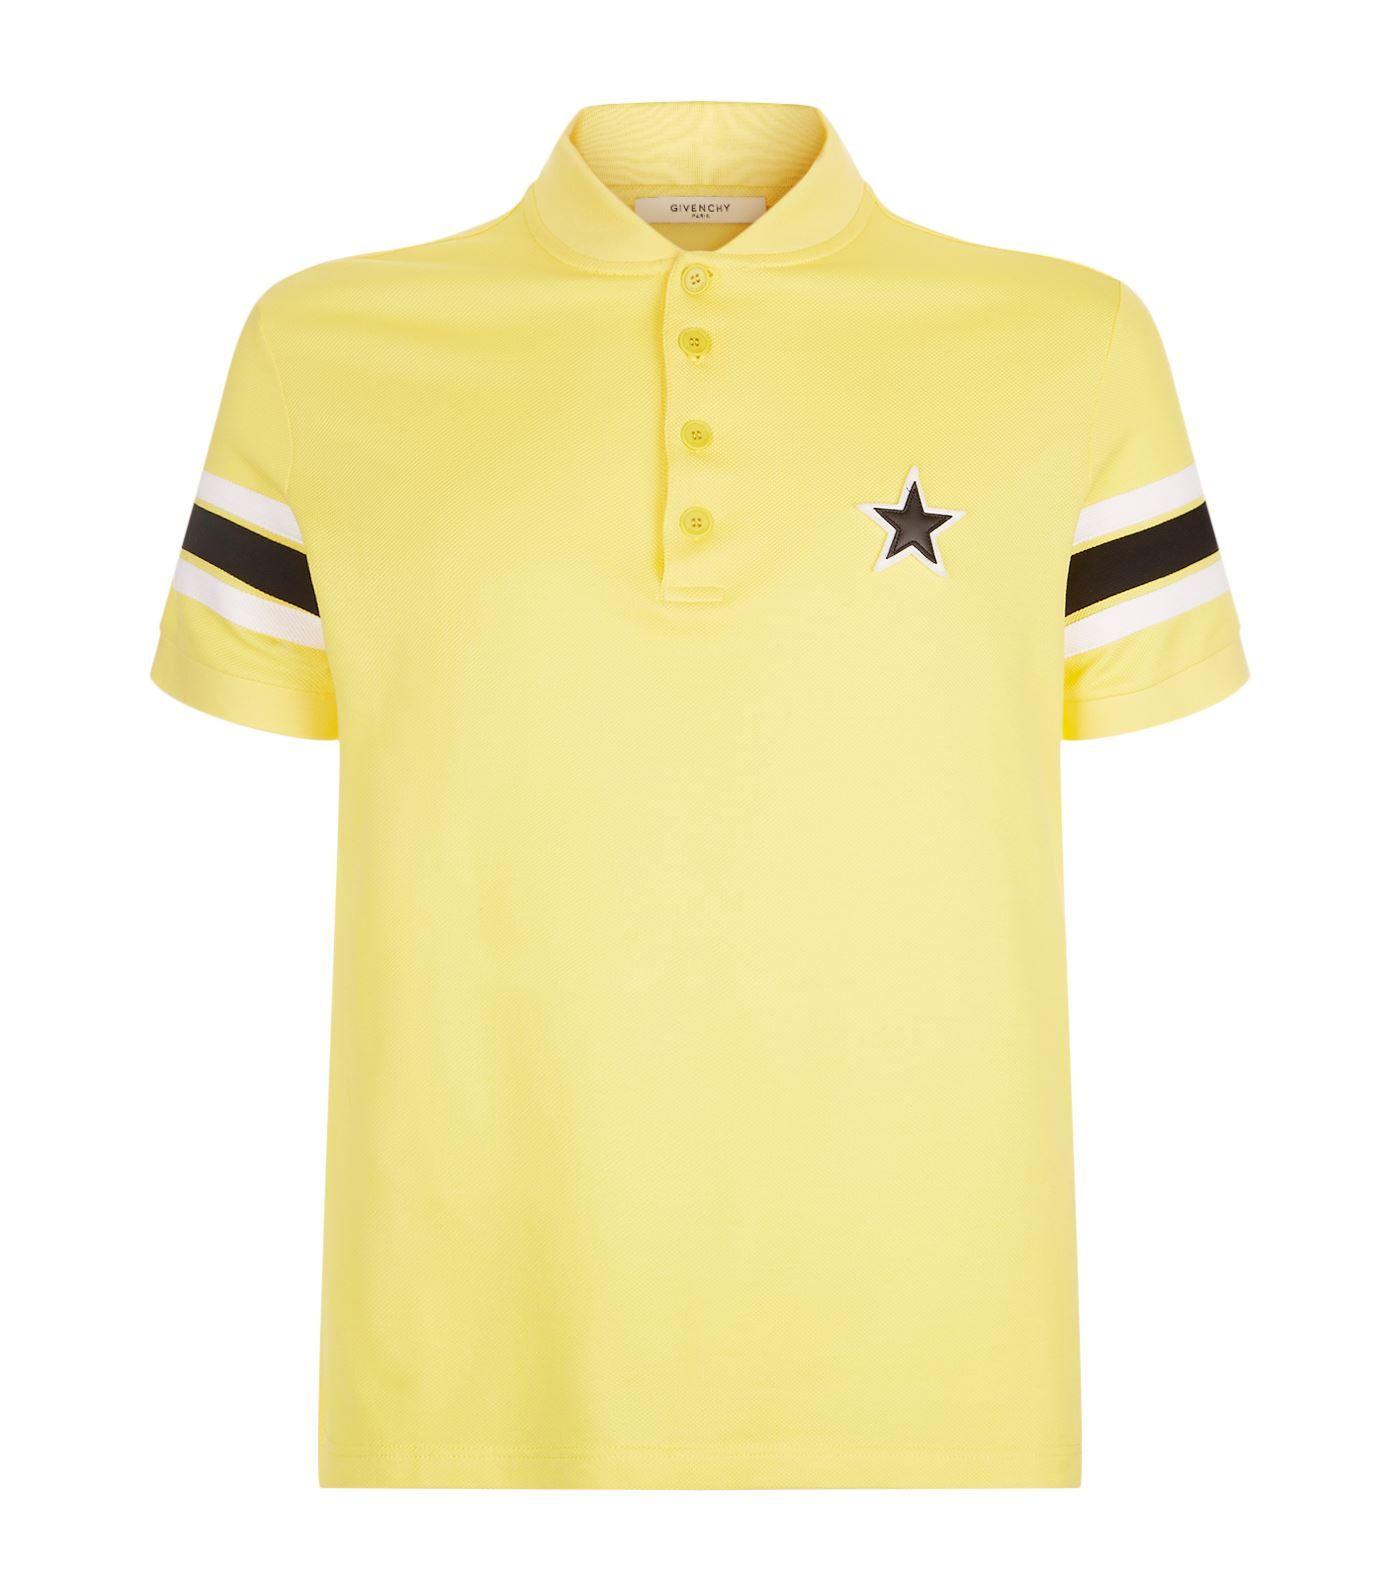 Givenchy Givenchy Cloth Shirts Online Shopping Clothes Polo Shirt